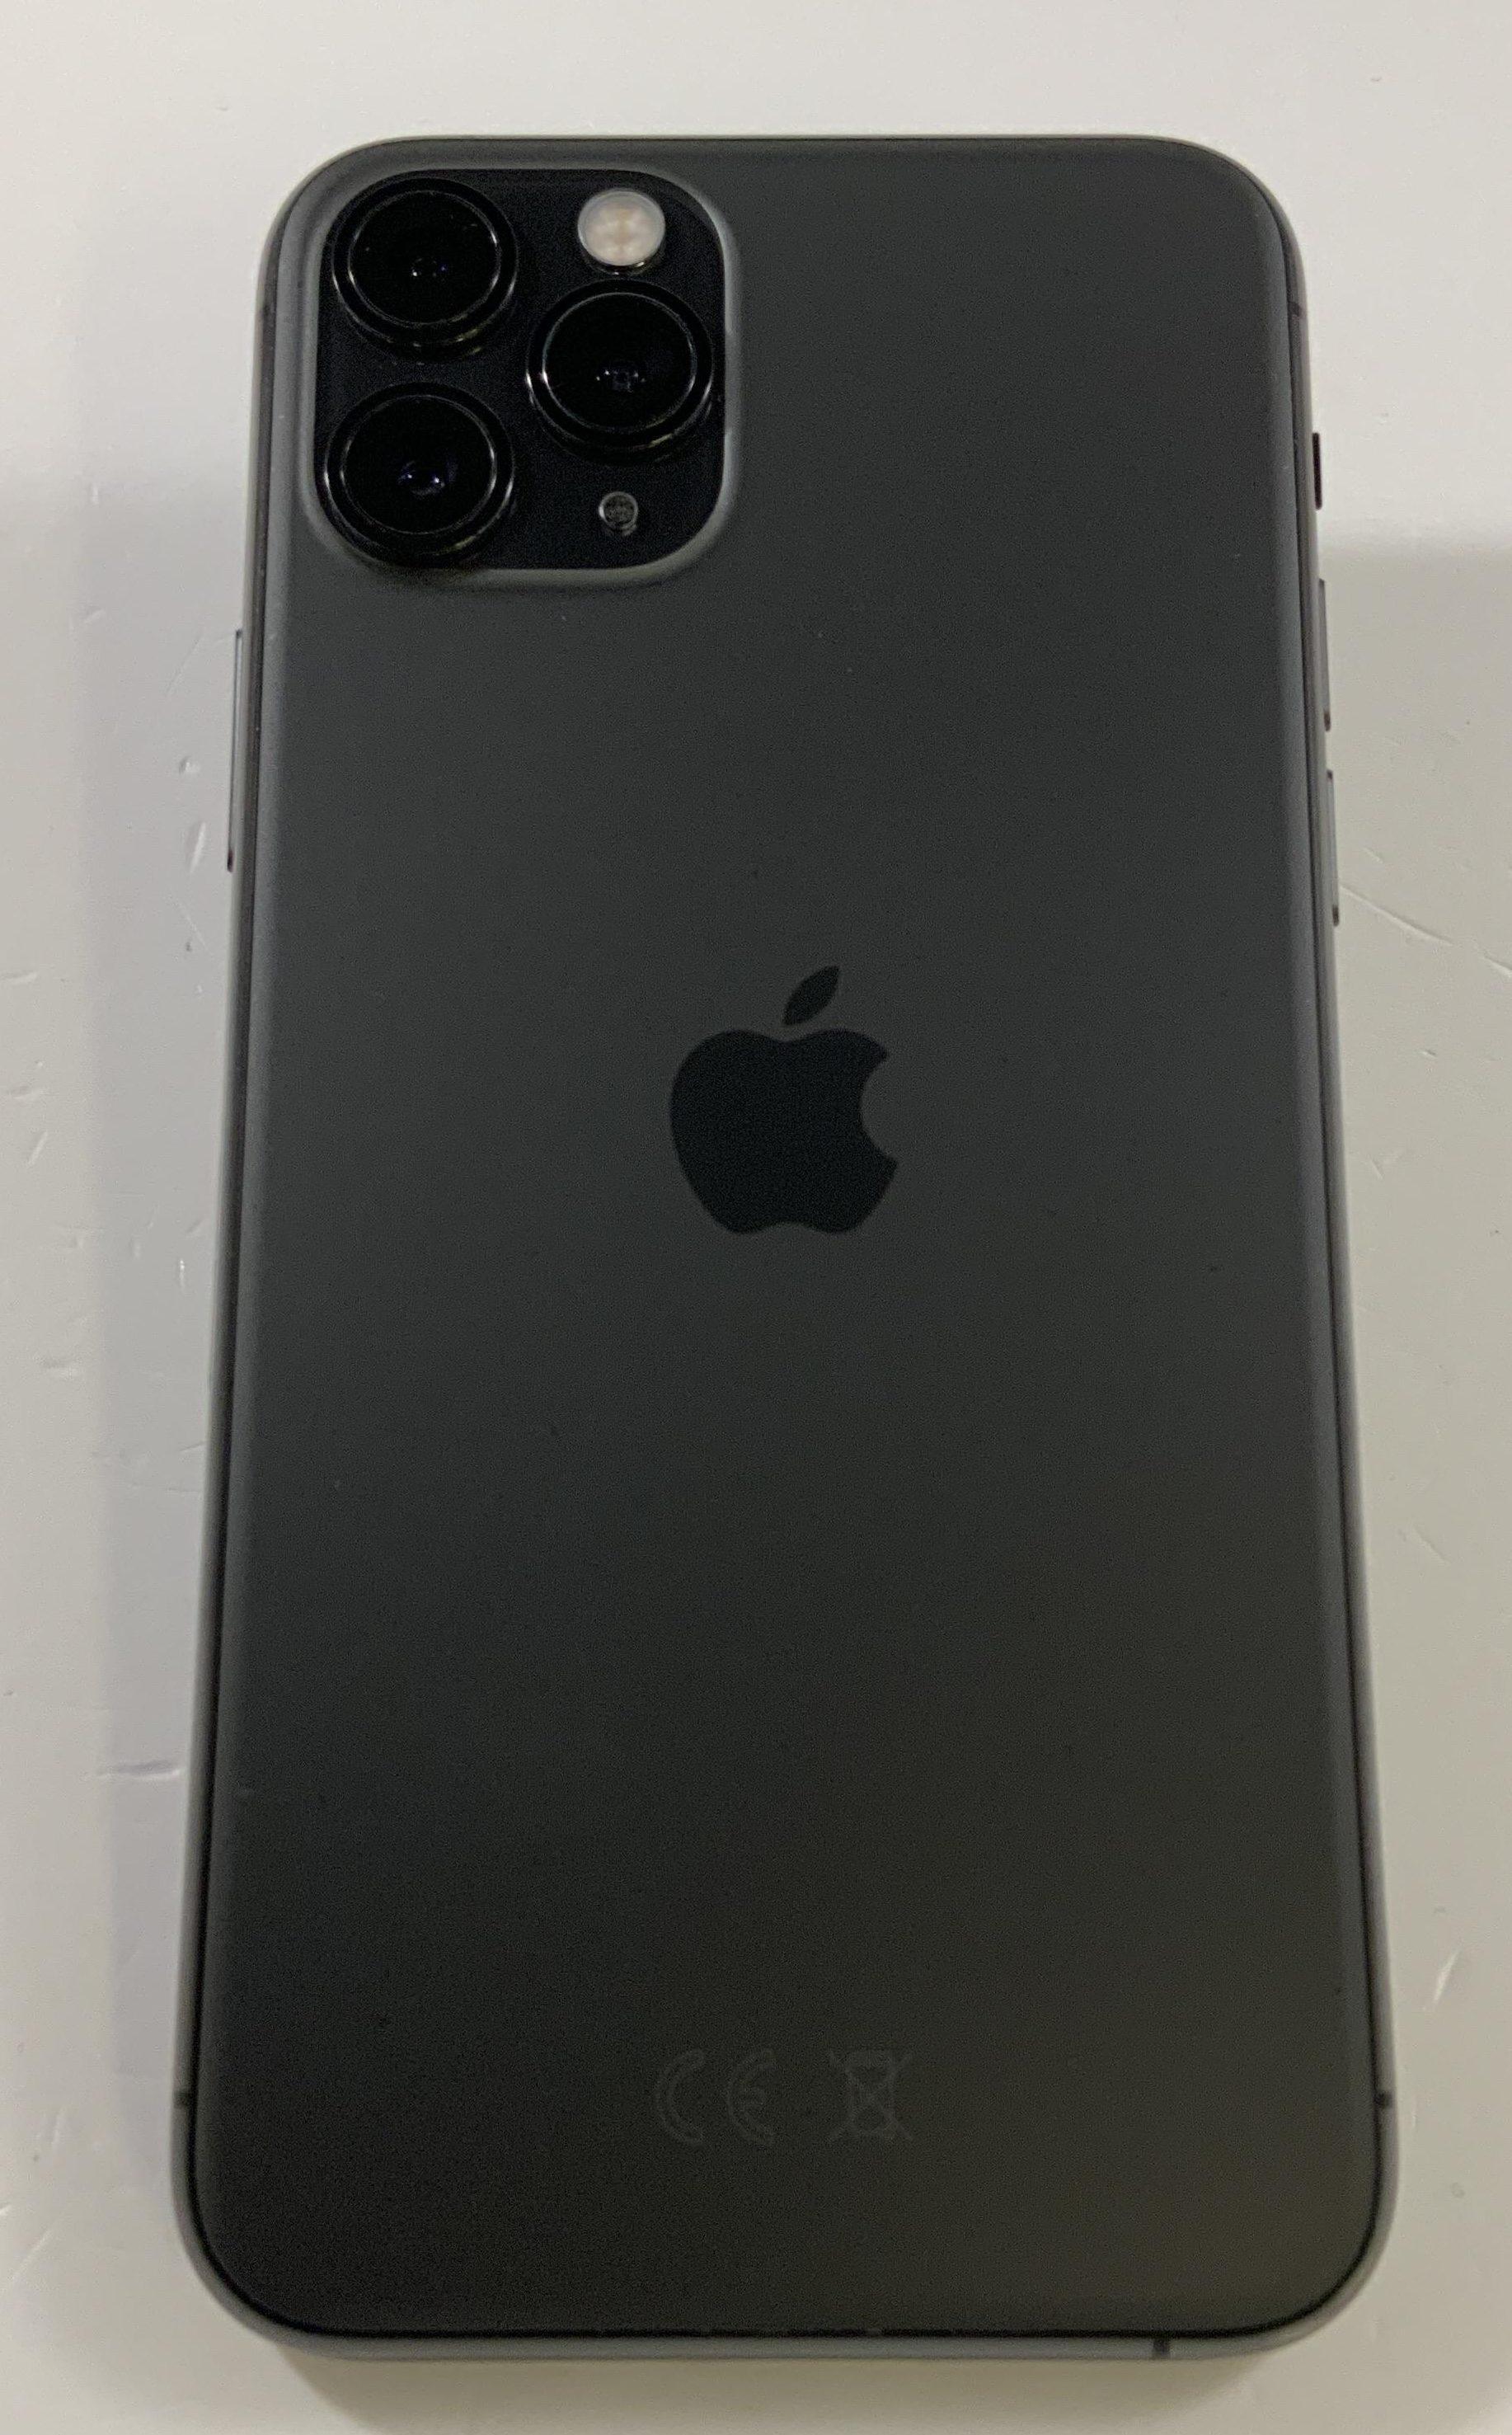 iPhone 11 Pro 64GB, 64GB, Space Gray, Afbeelding 2